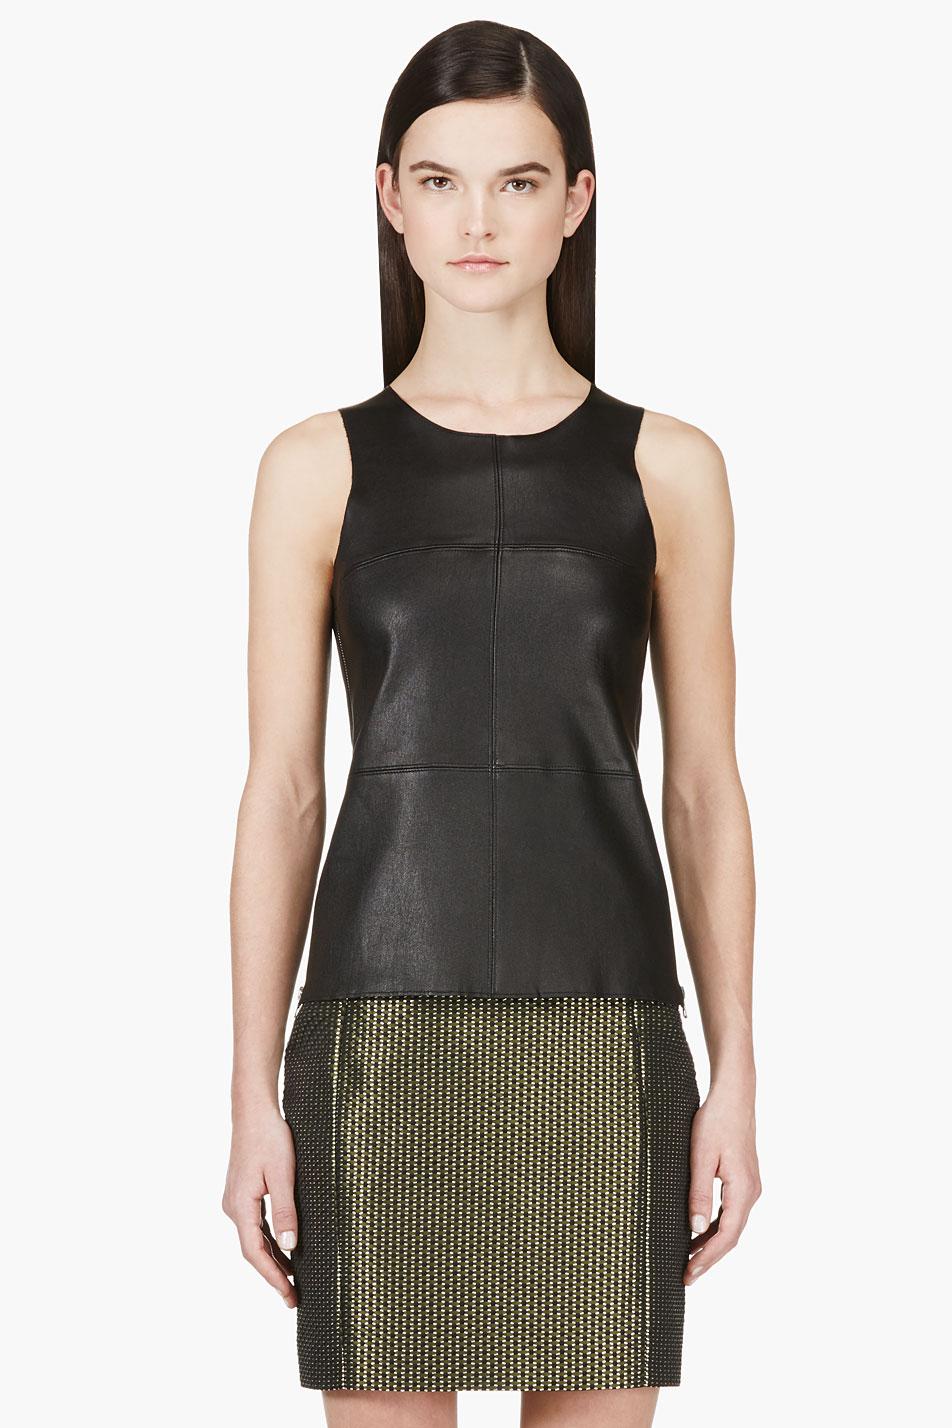 mackage ssense exclusive black stretch leather sierra tank top